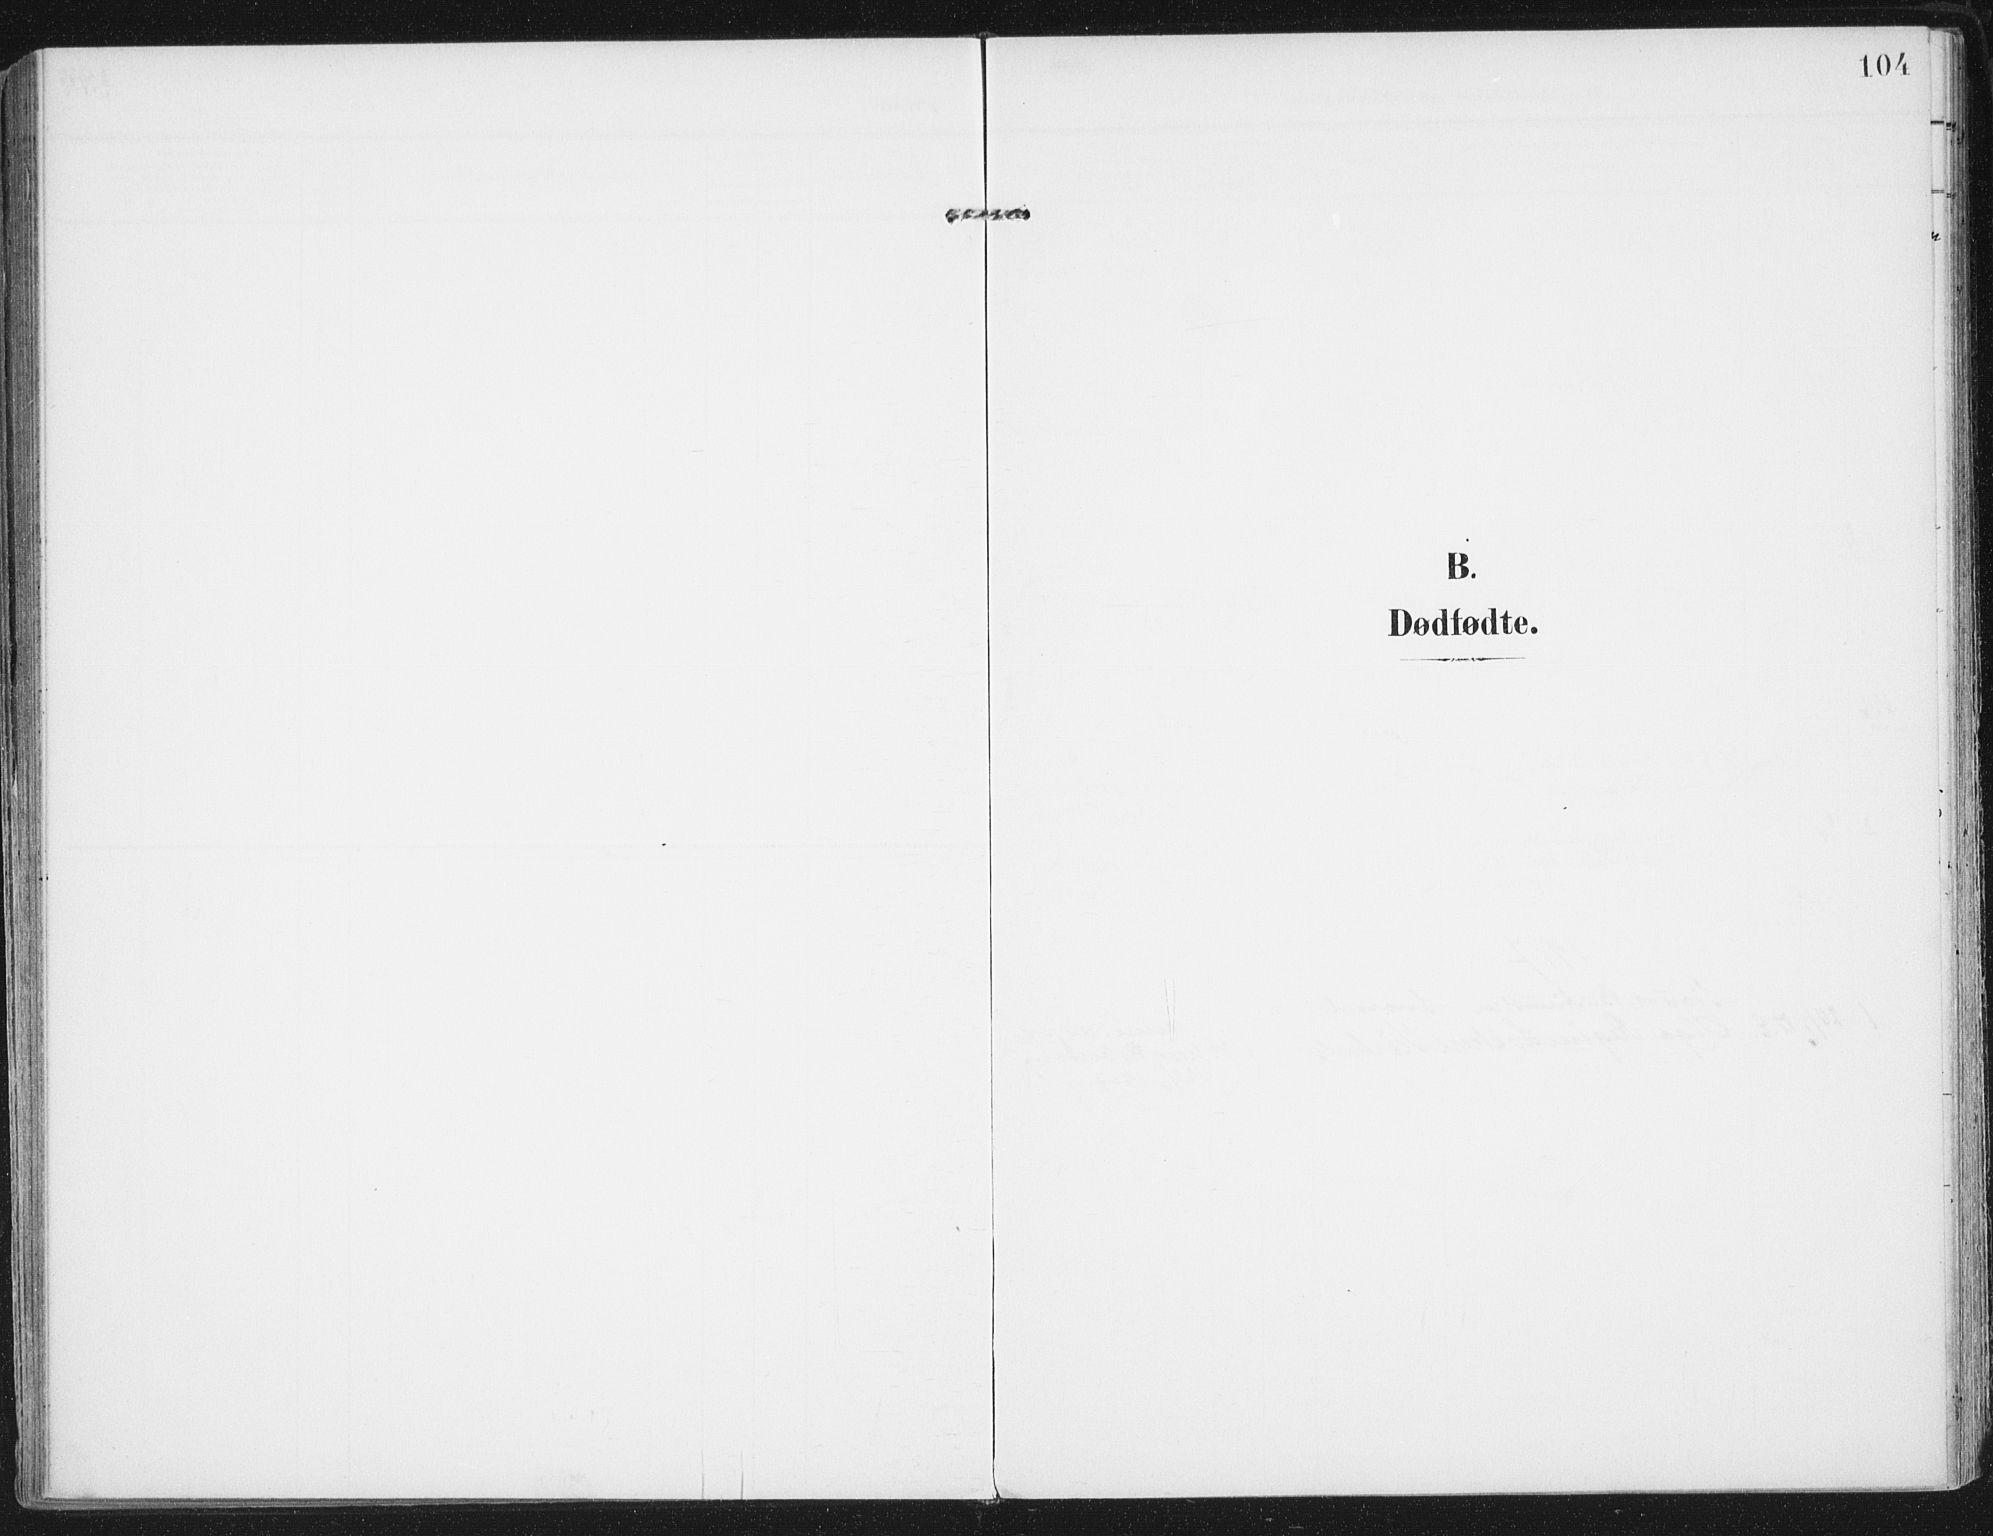 SAT, Ministerialprotokoller, klokkerbøker og fødselsregistre - Nordland, 892/L1321: Ministerialbok nr. 892A02, 1902-1918, s. 104